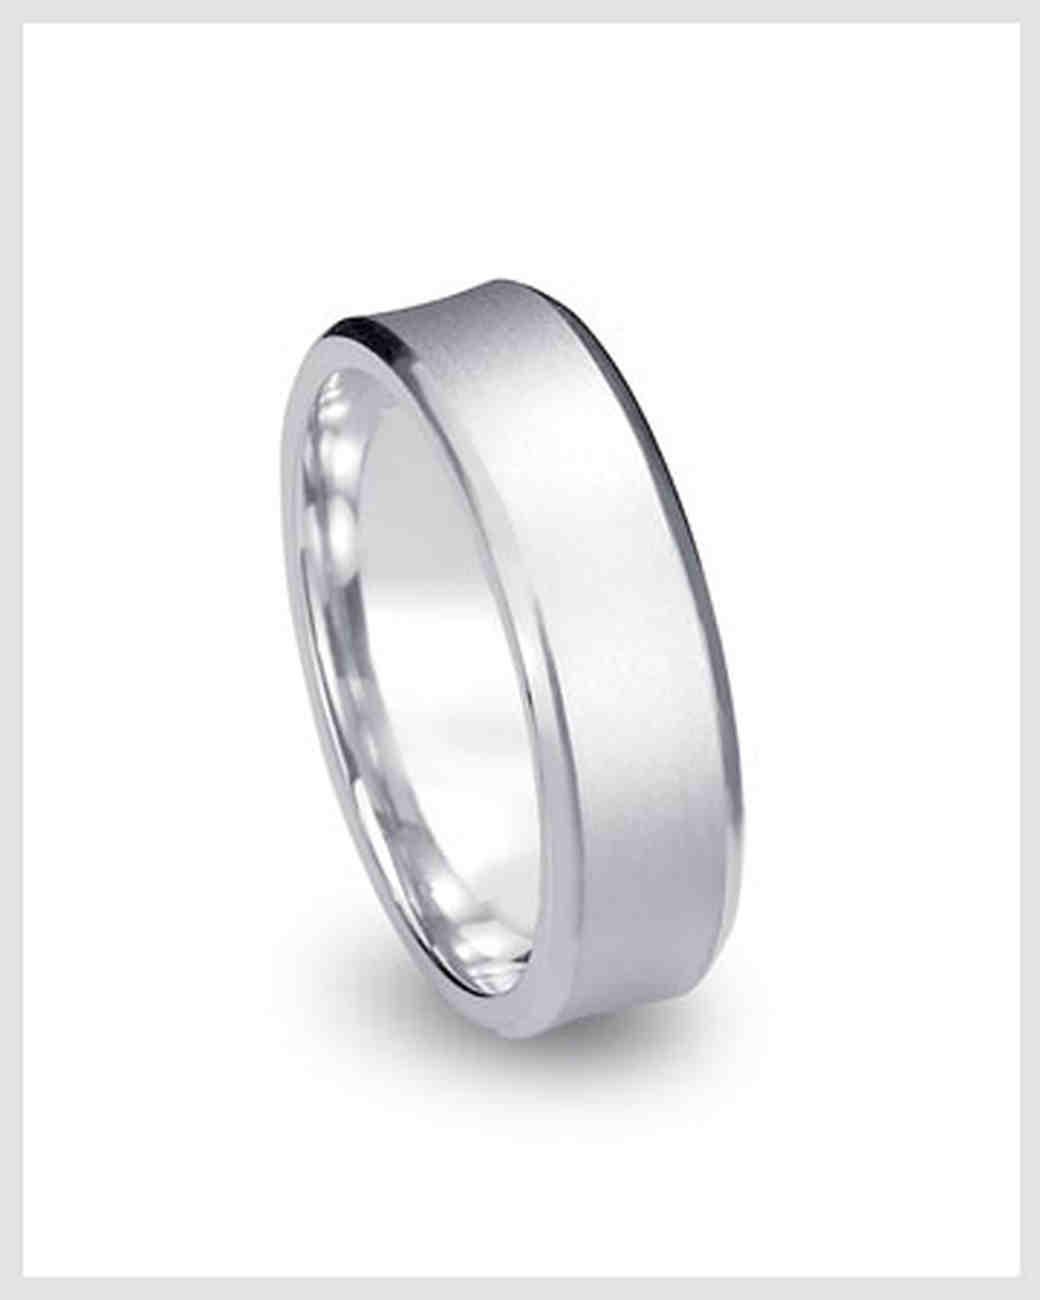 pgi-finish-jewelry-finder-0413-2.jpg